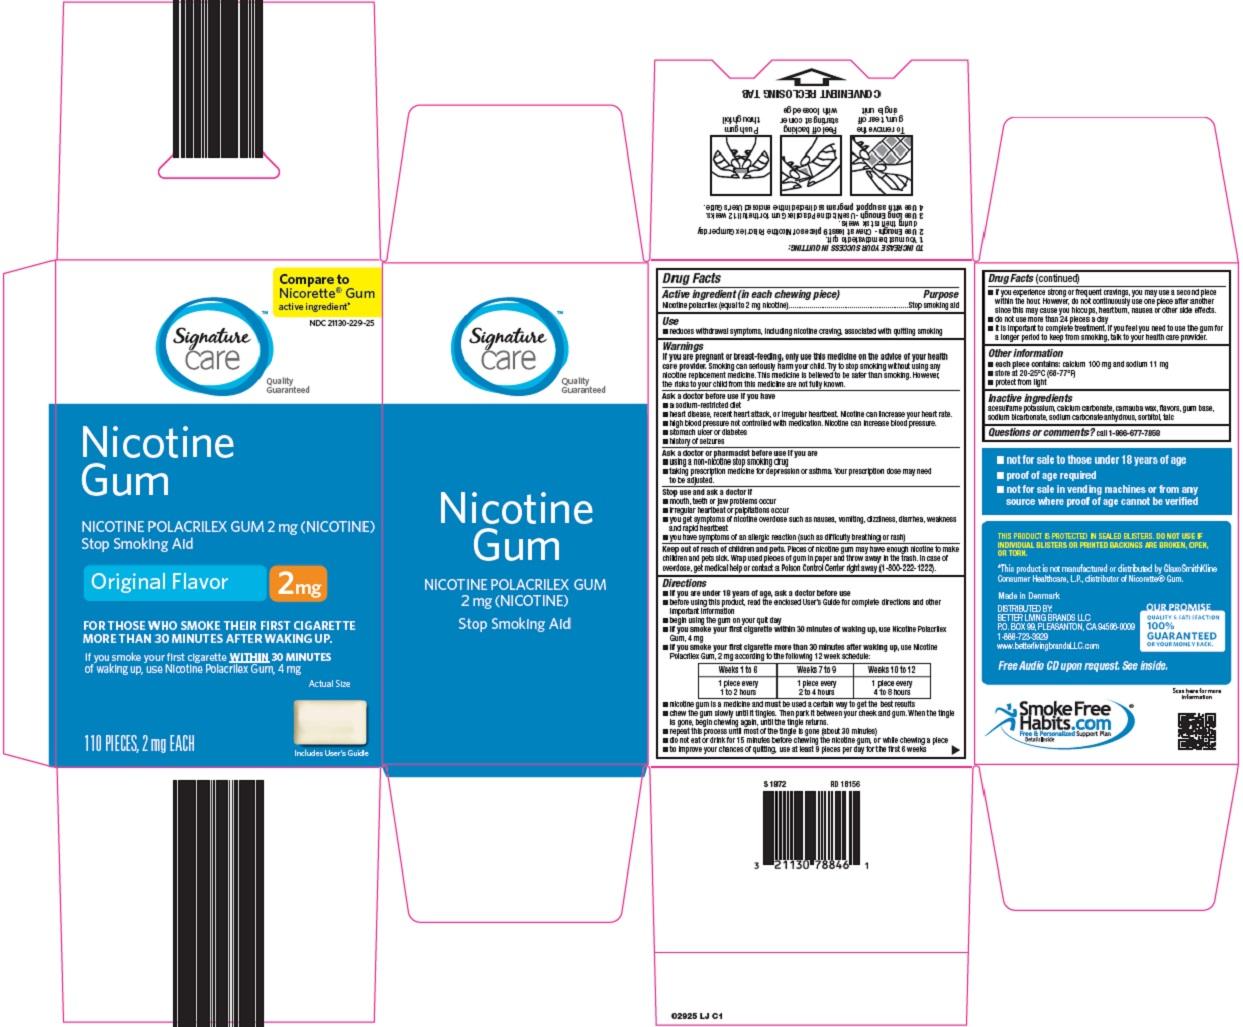 nicotine-gum-image